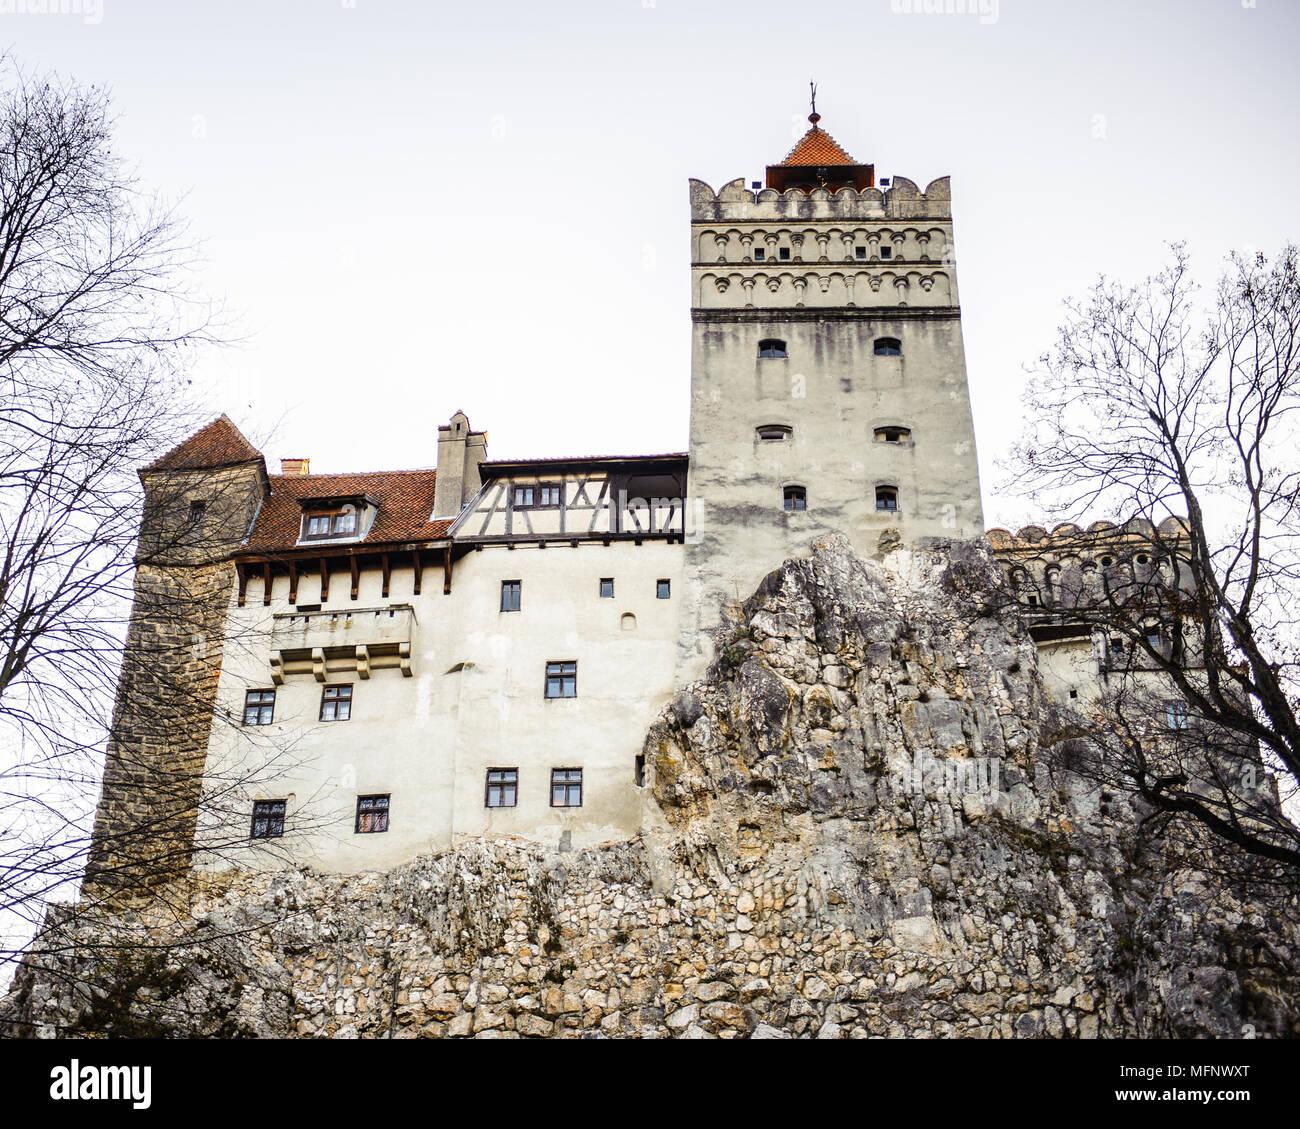 Draculas Schloss in Bran, Rumänien. Es ist, als die Heimat der Vampire Dracula, Roman Charakter des Bram Stoker vermarktet. Stockbild